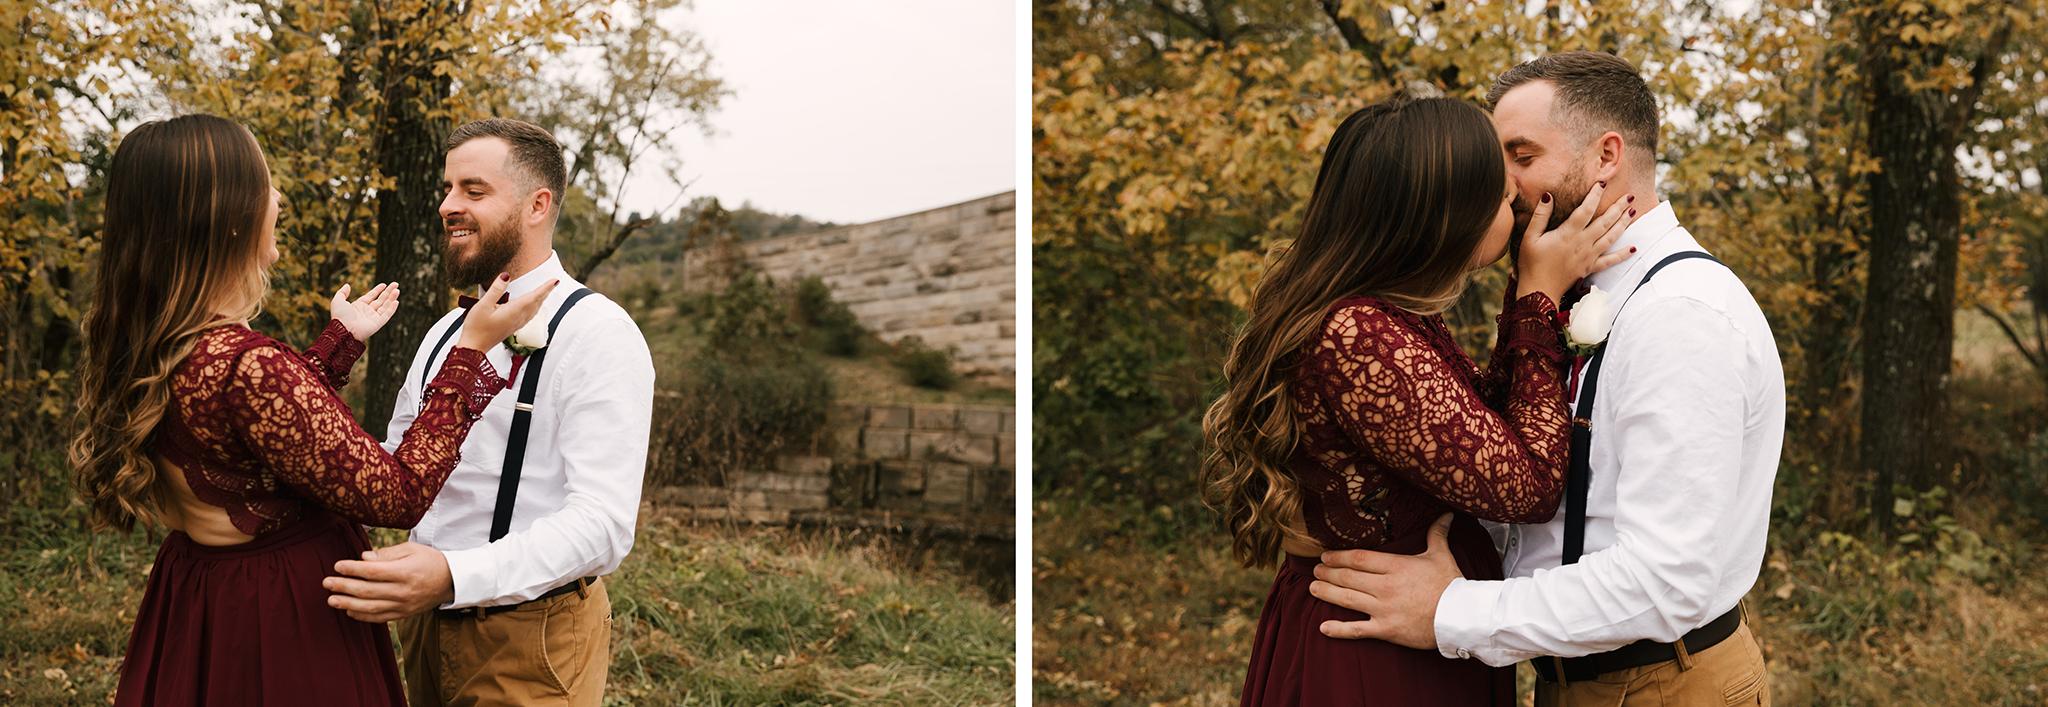 Red-Photographic-Wedding-Kentucky-Cisar-4.JPG